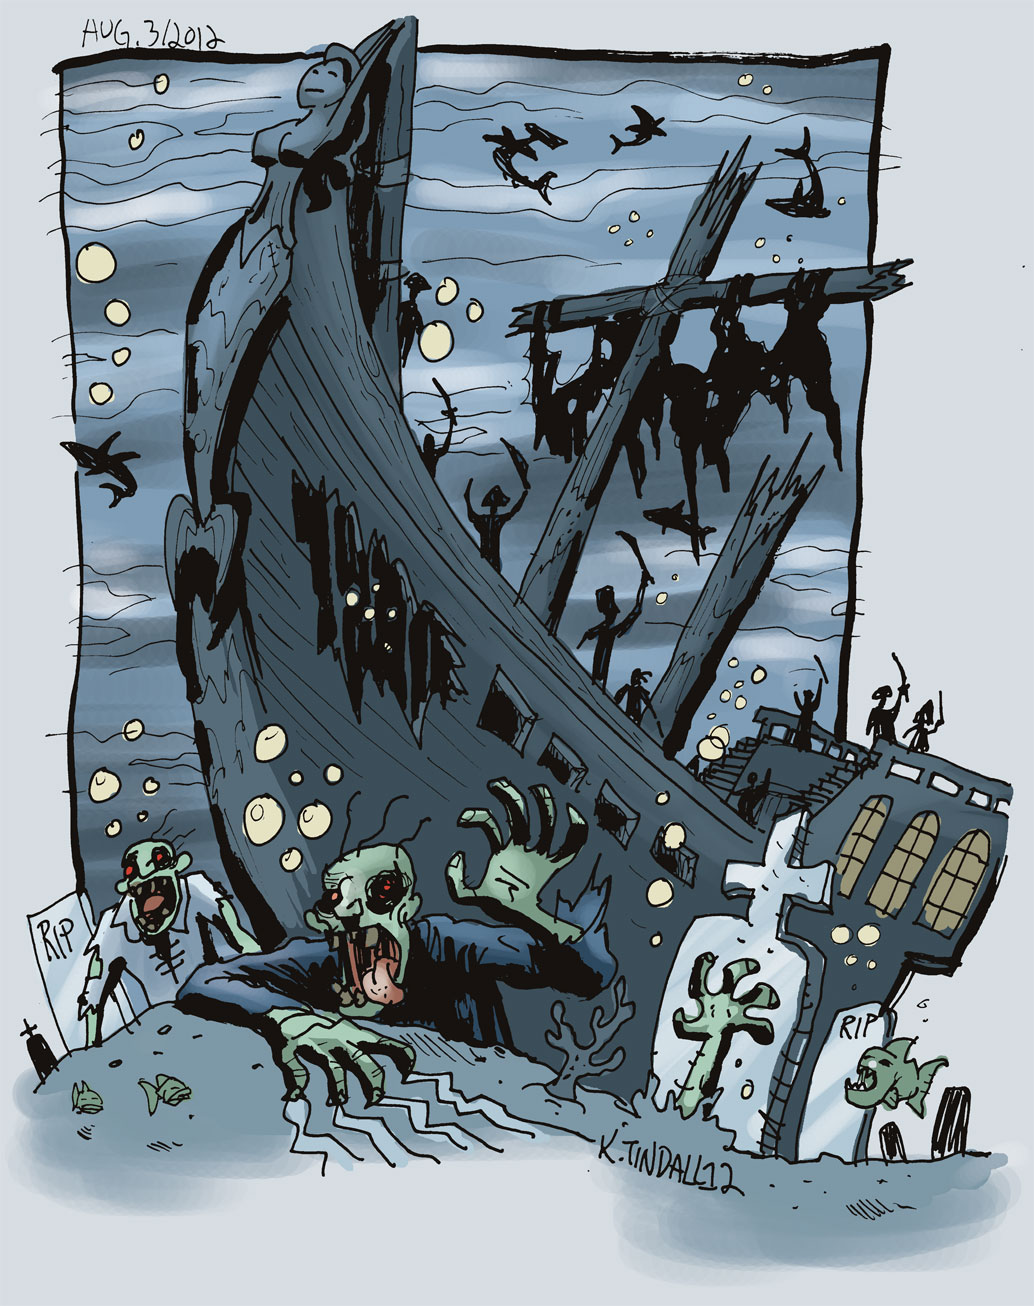 Sunken Ship Cartoon Zombies crawling out of sunken